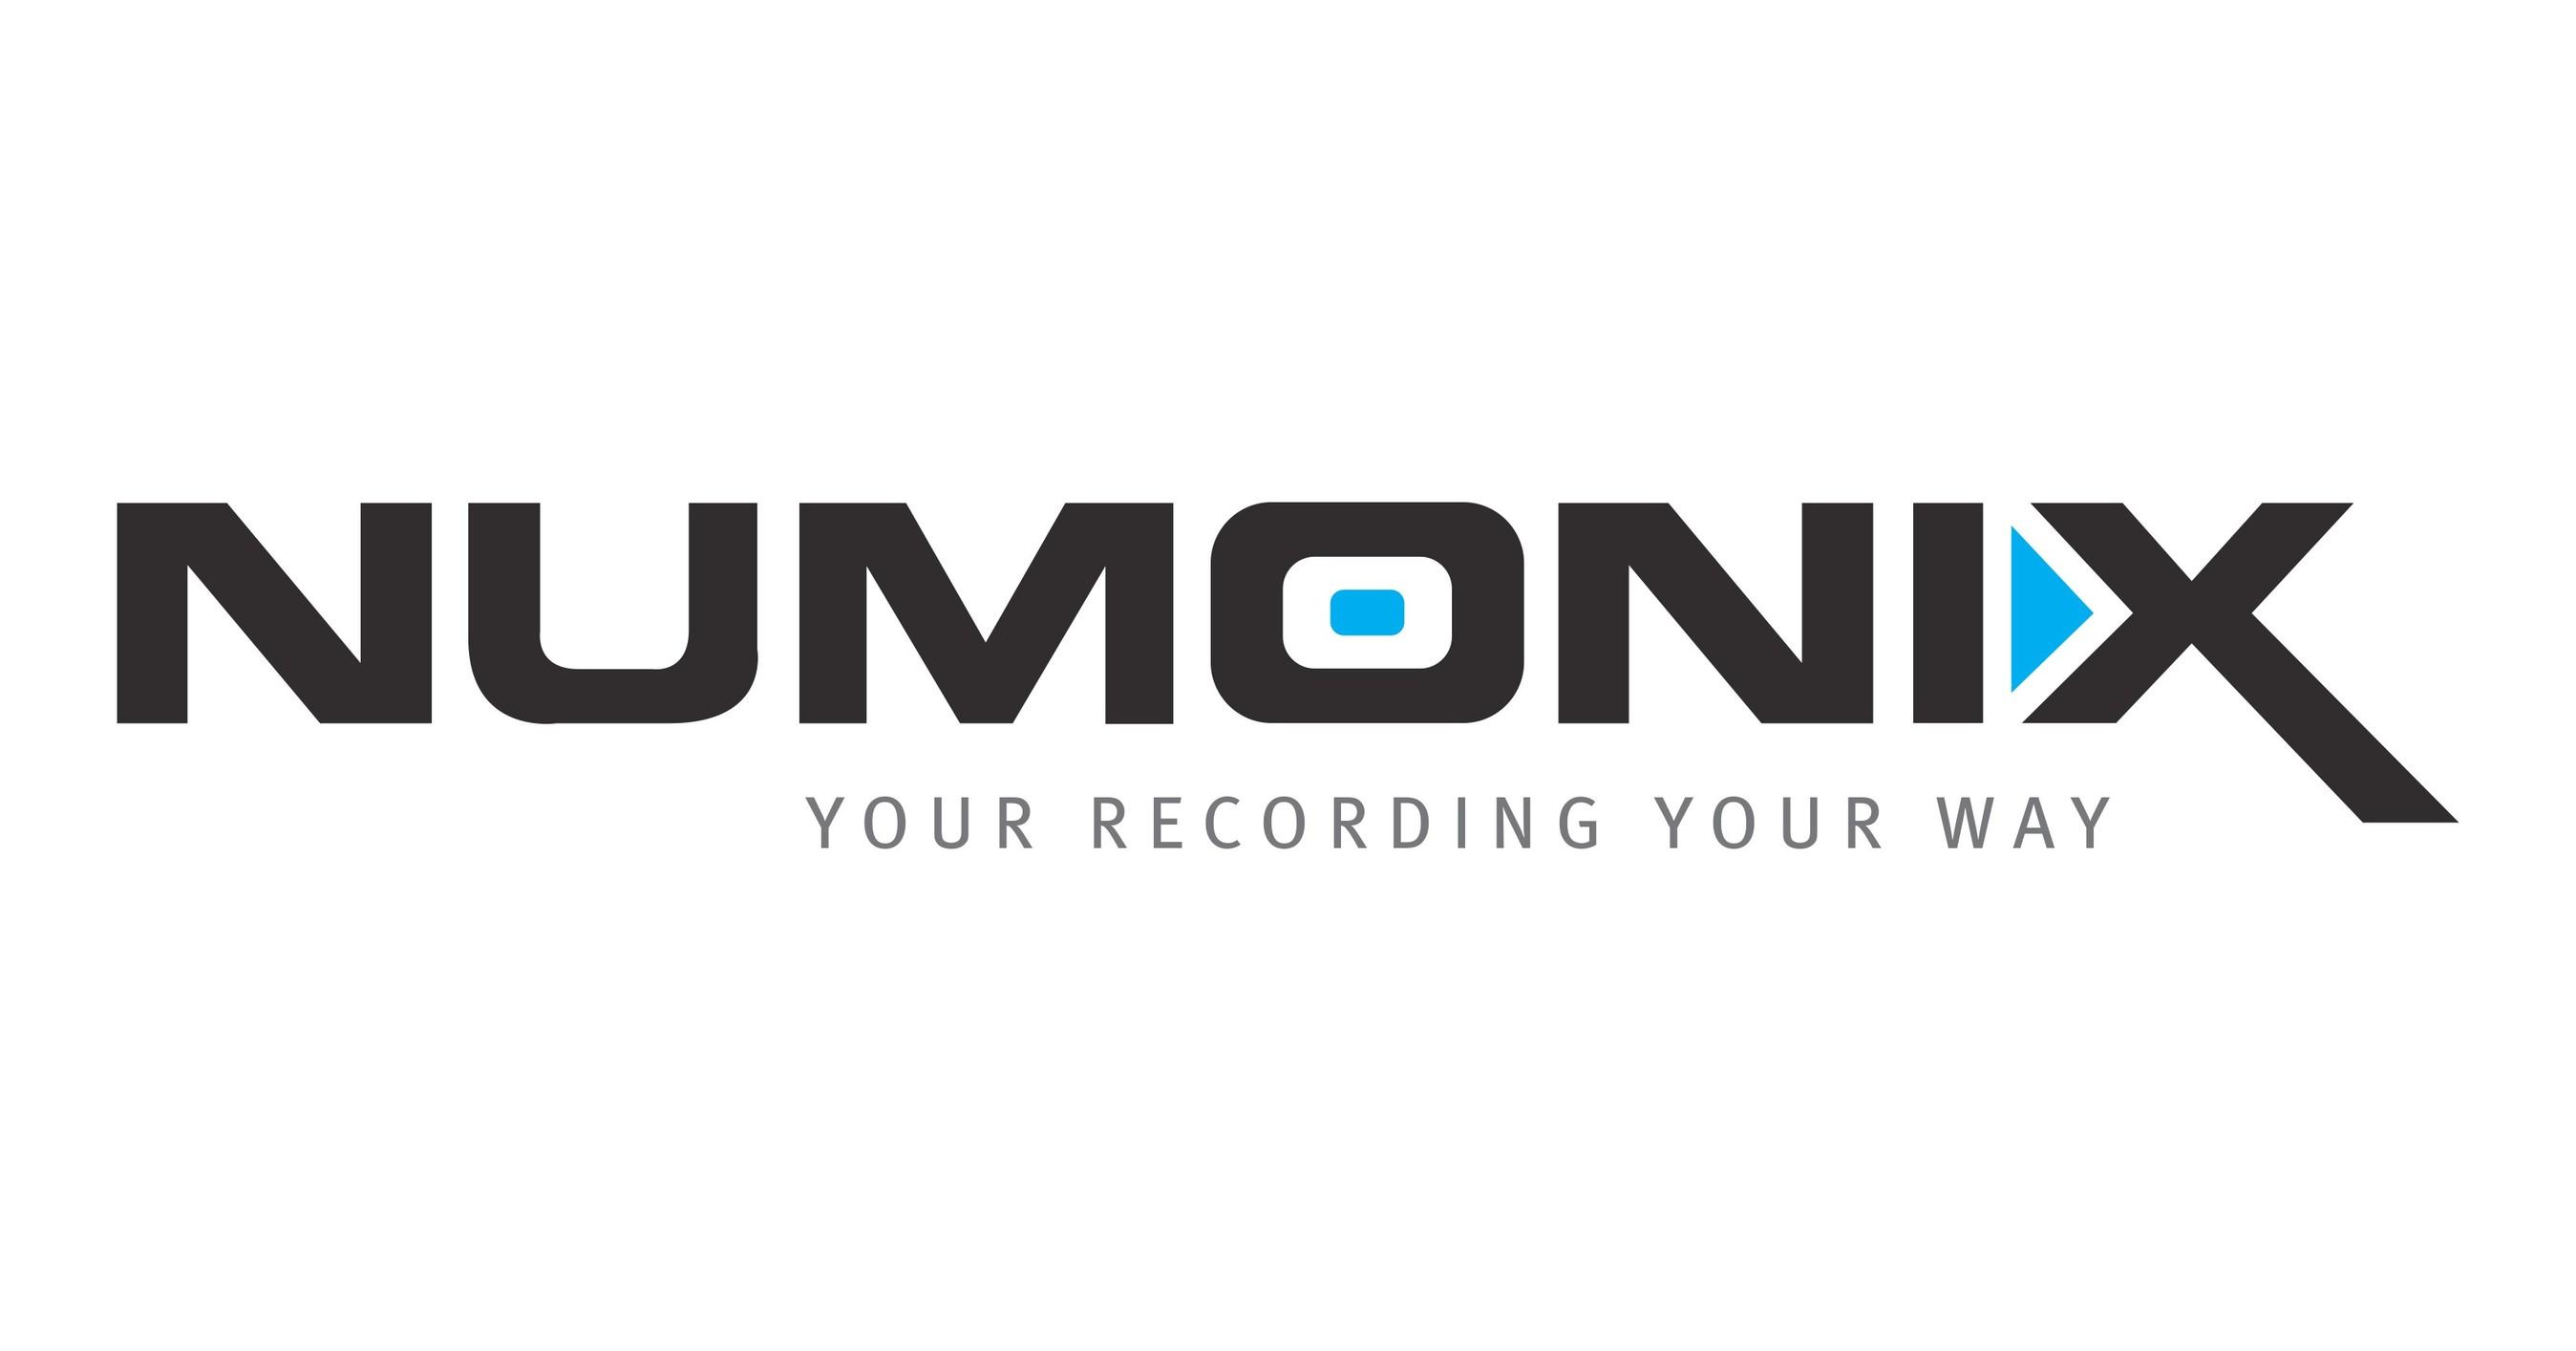 Numonix Announces Collaboration with Microsoft for Teams